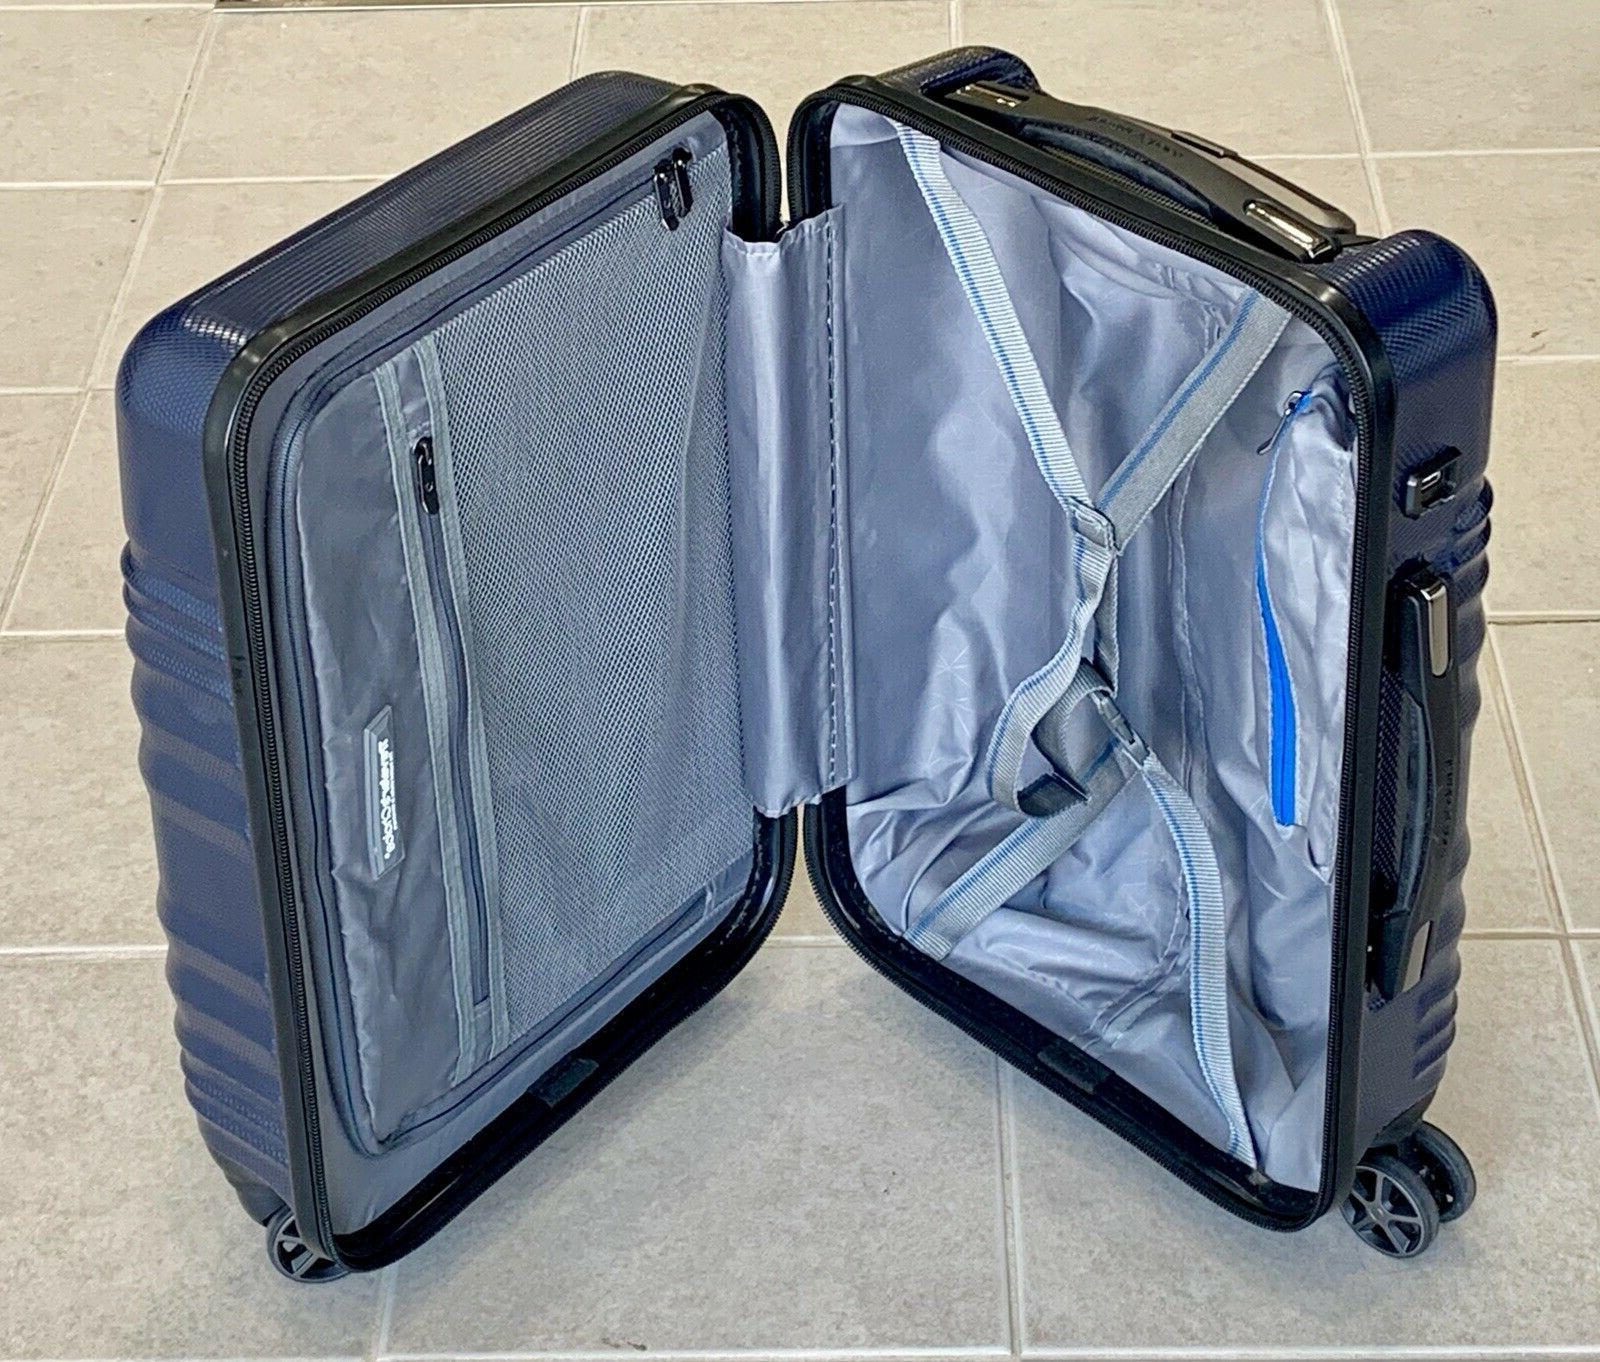 Traveler's on hardcase Luggage spinner